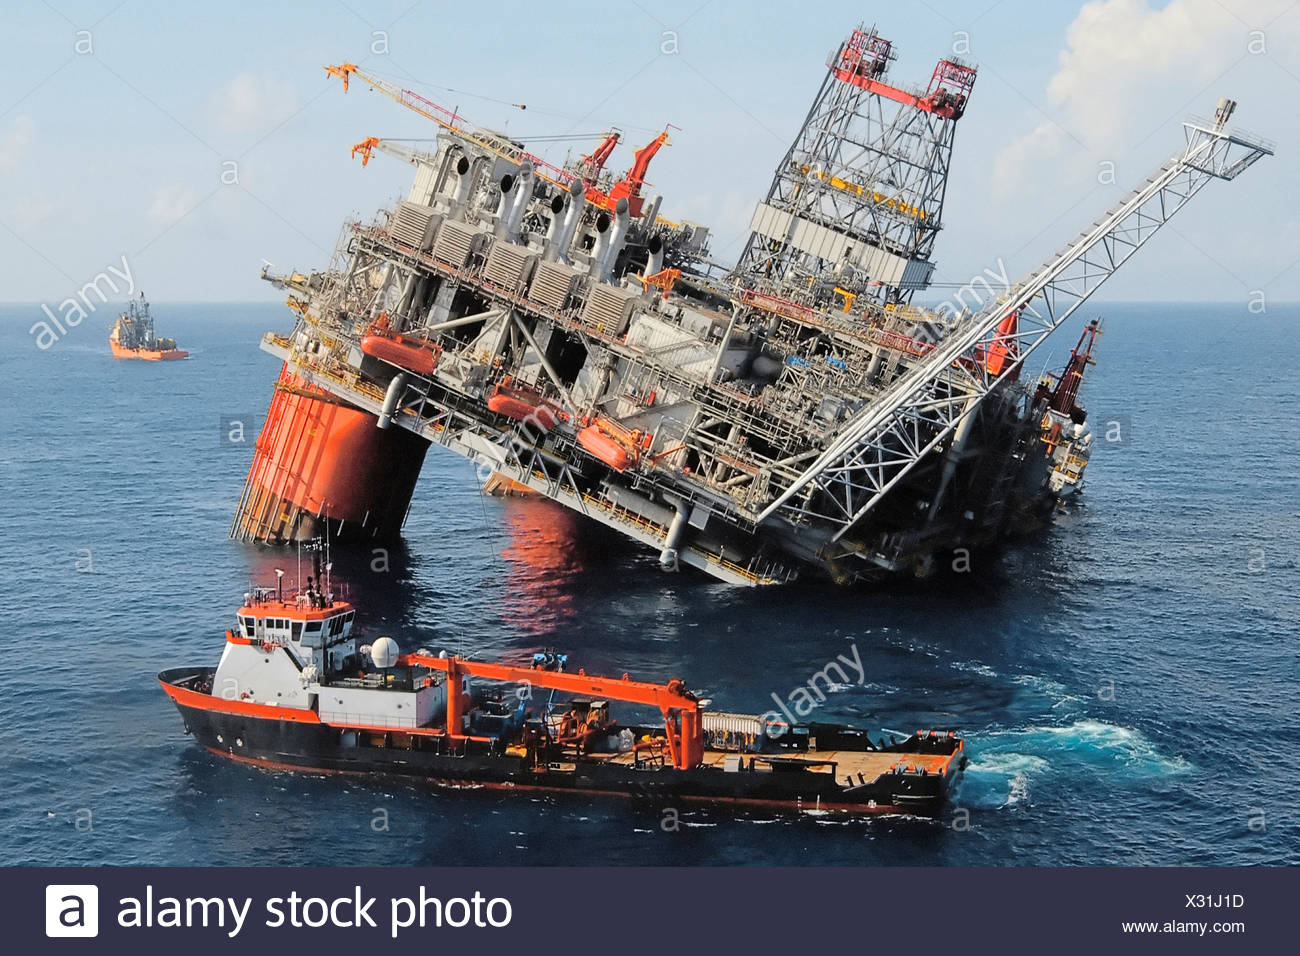 Hurricane Disaster Ship Stock Photos Amp Hurricane Disaster Ship Stock Images Alamy